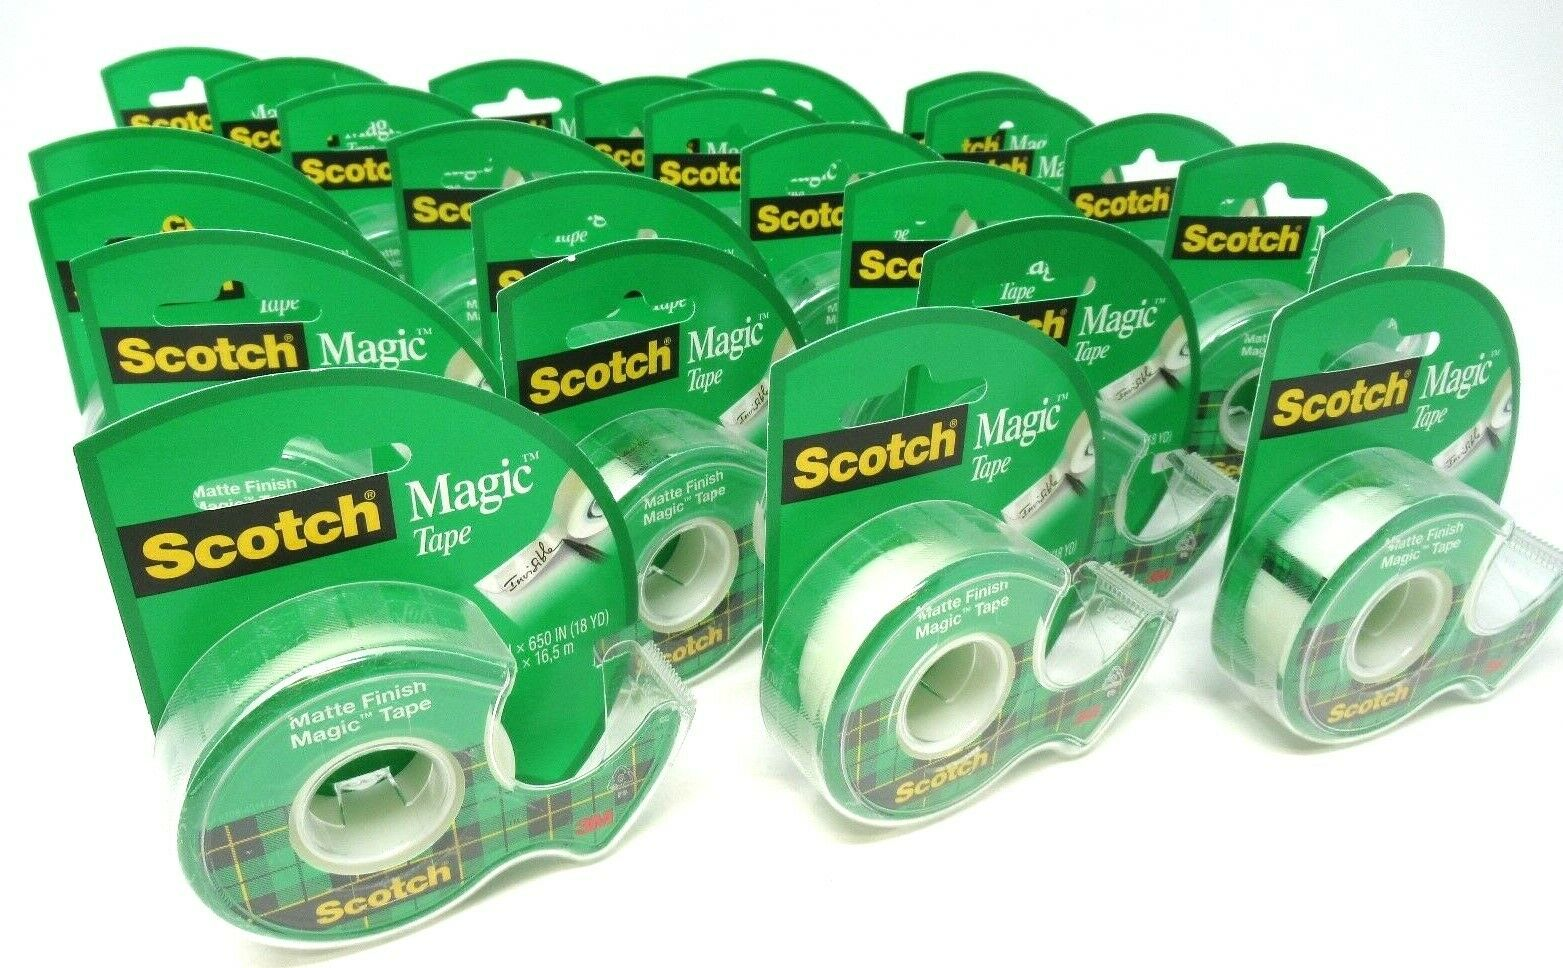 Scotch Magic Tape Refillable Dispenser Writeable 3 4  x 650  Each  24 Count